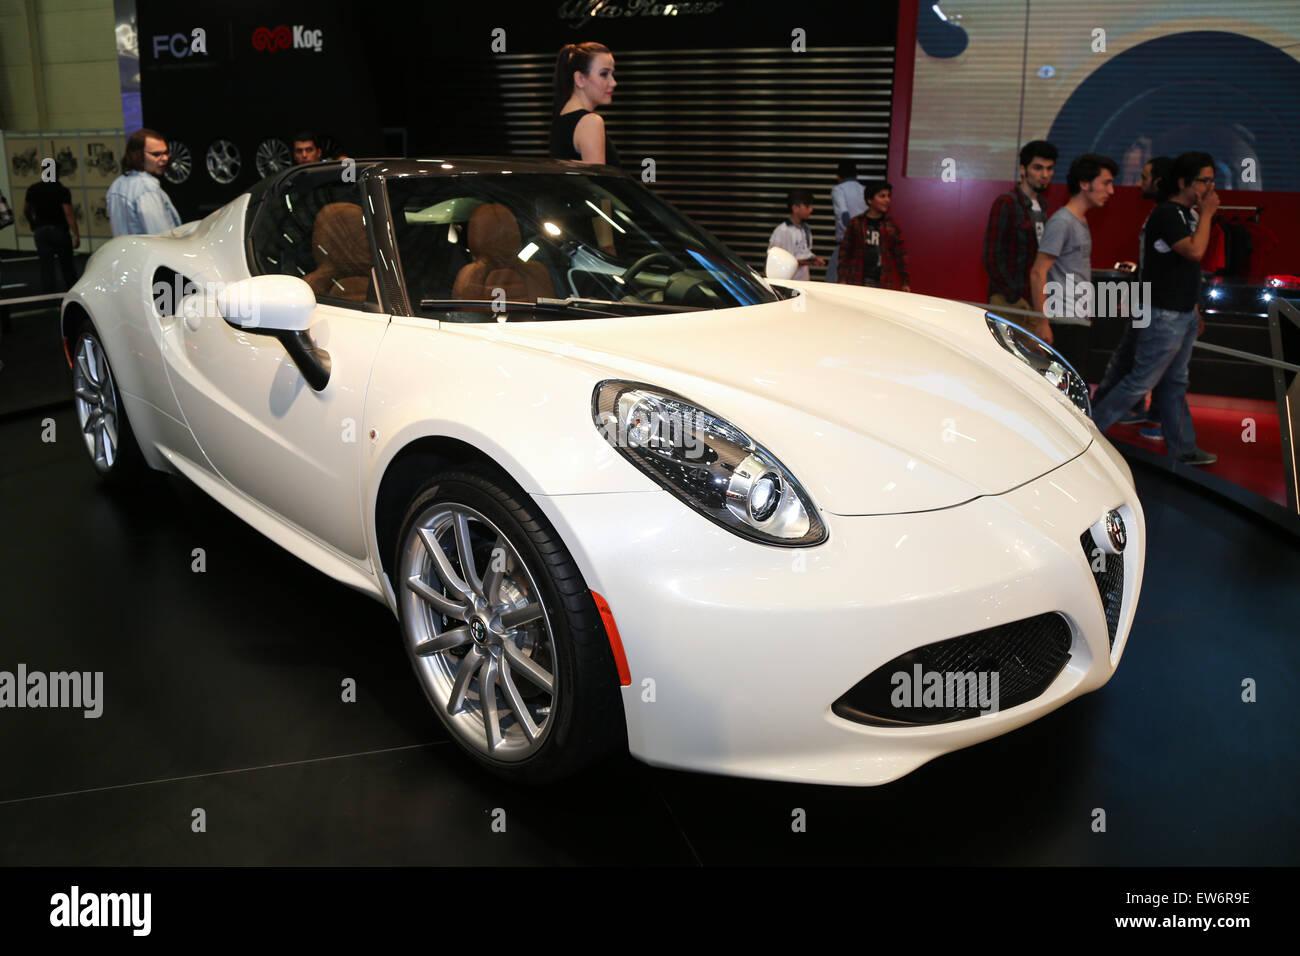 Alfa Romeo 4c Spider Istanbul Autoshow 2015 Stock Photo 84357882